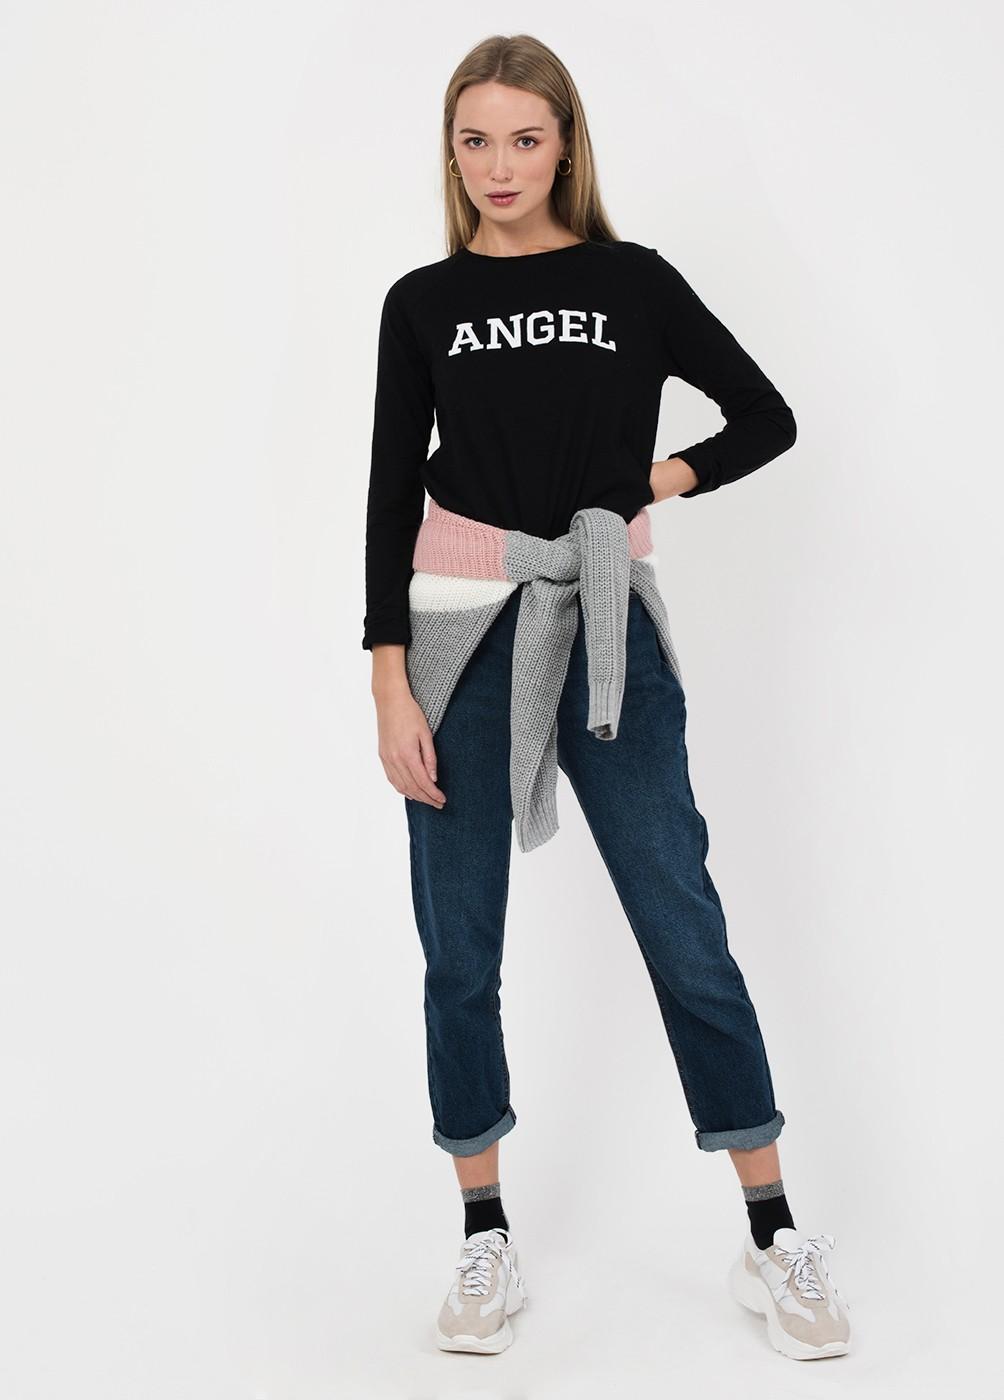 Camiseta Angel2 M/Larga